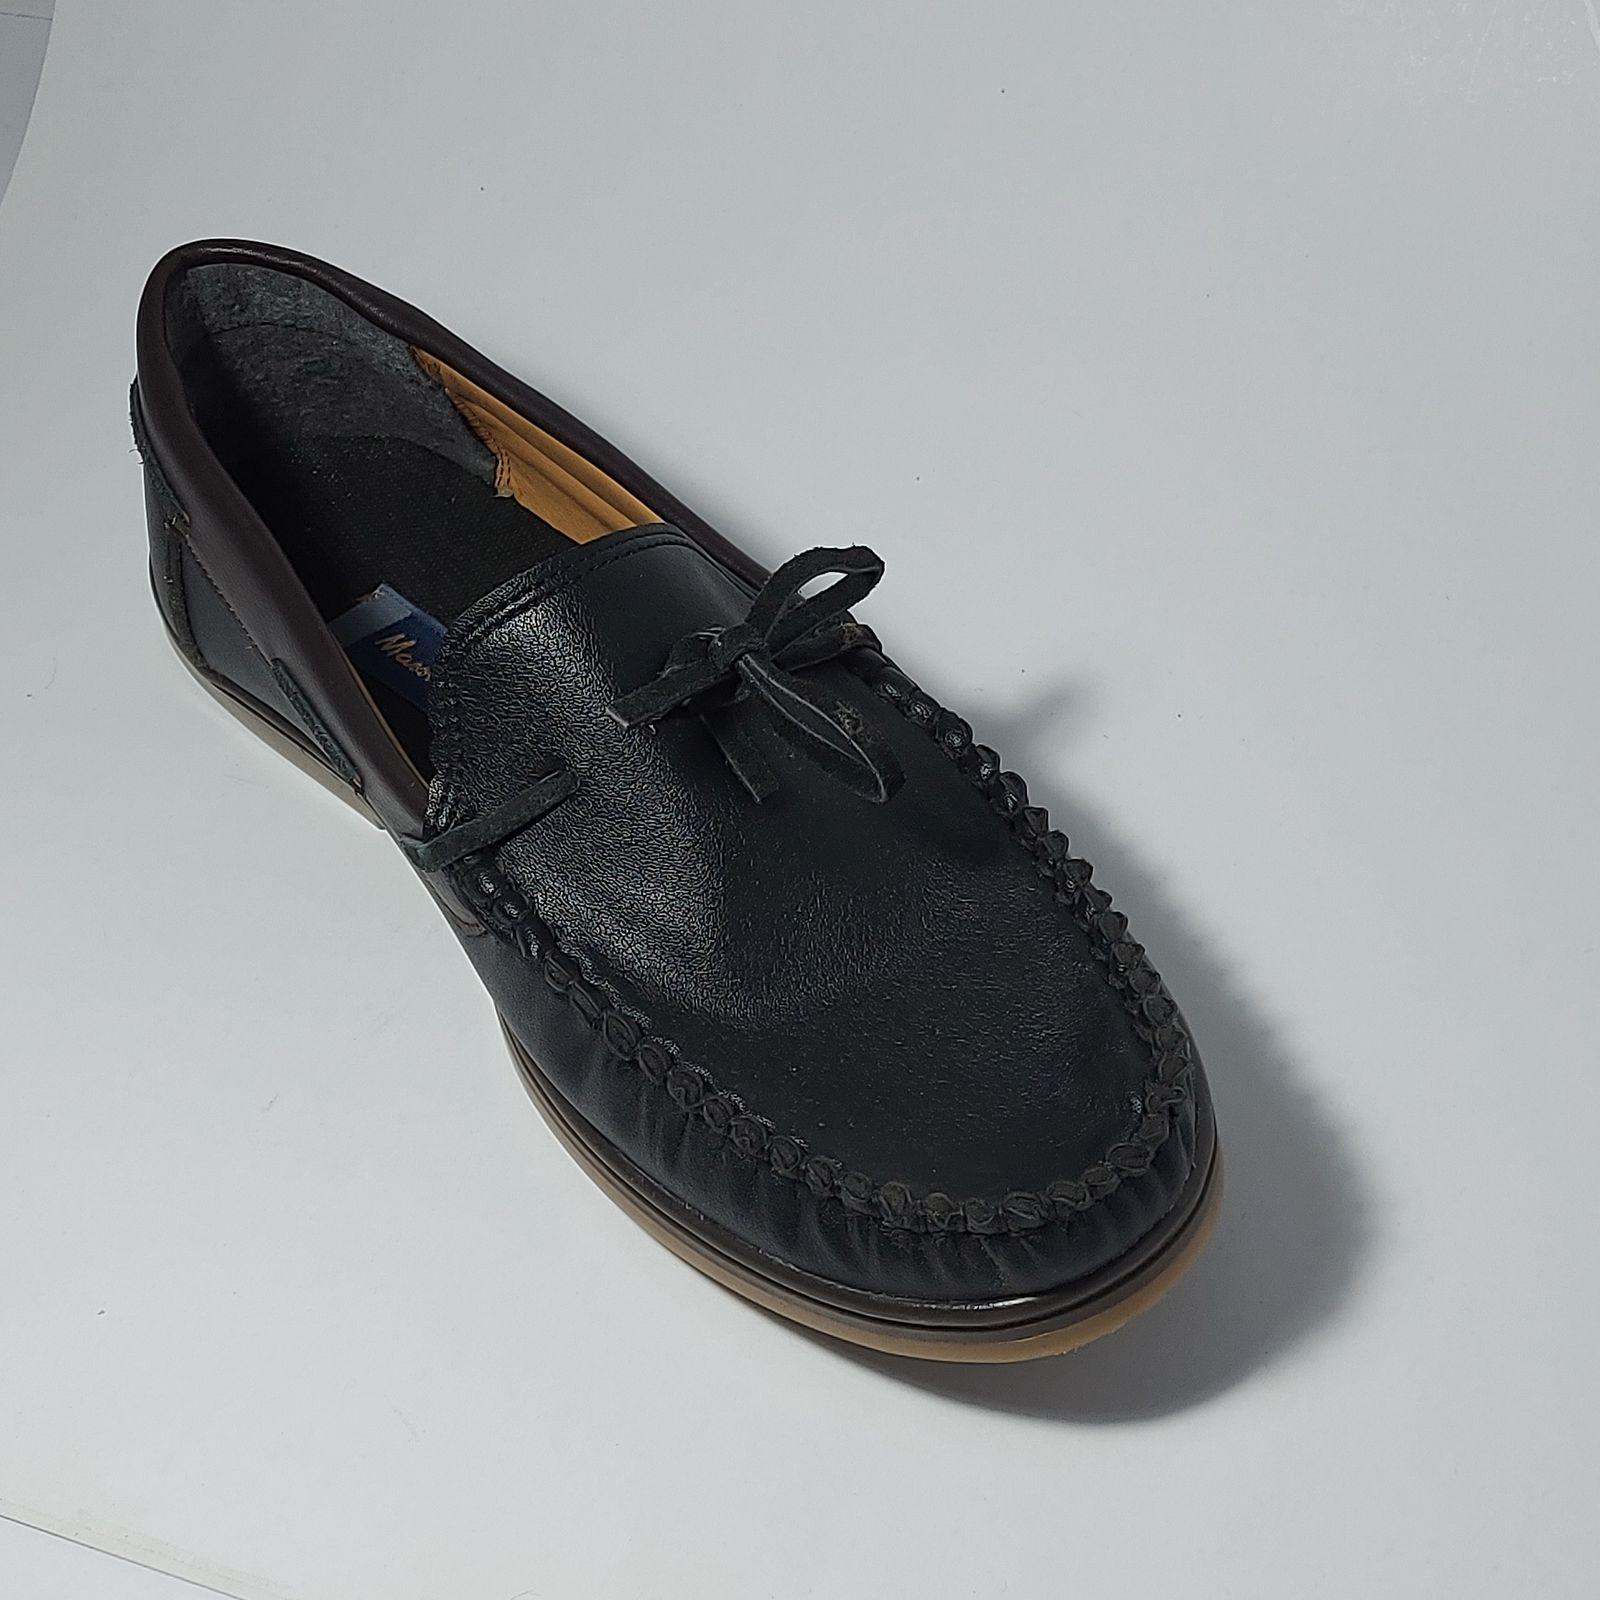 کفش روزمره مردانه مدل CH002 -  - 4